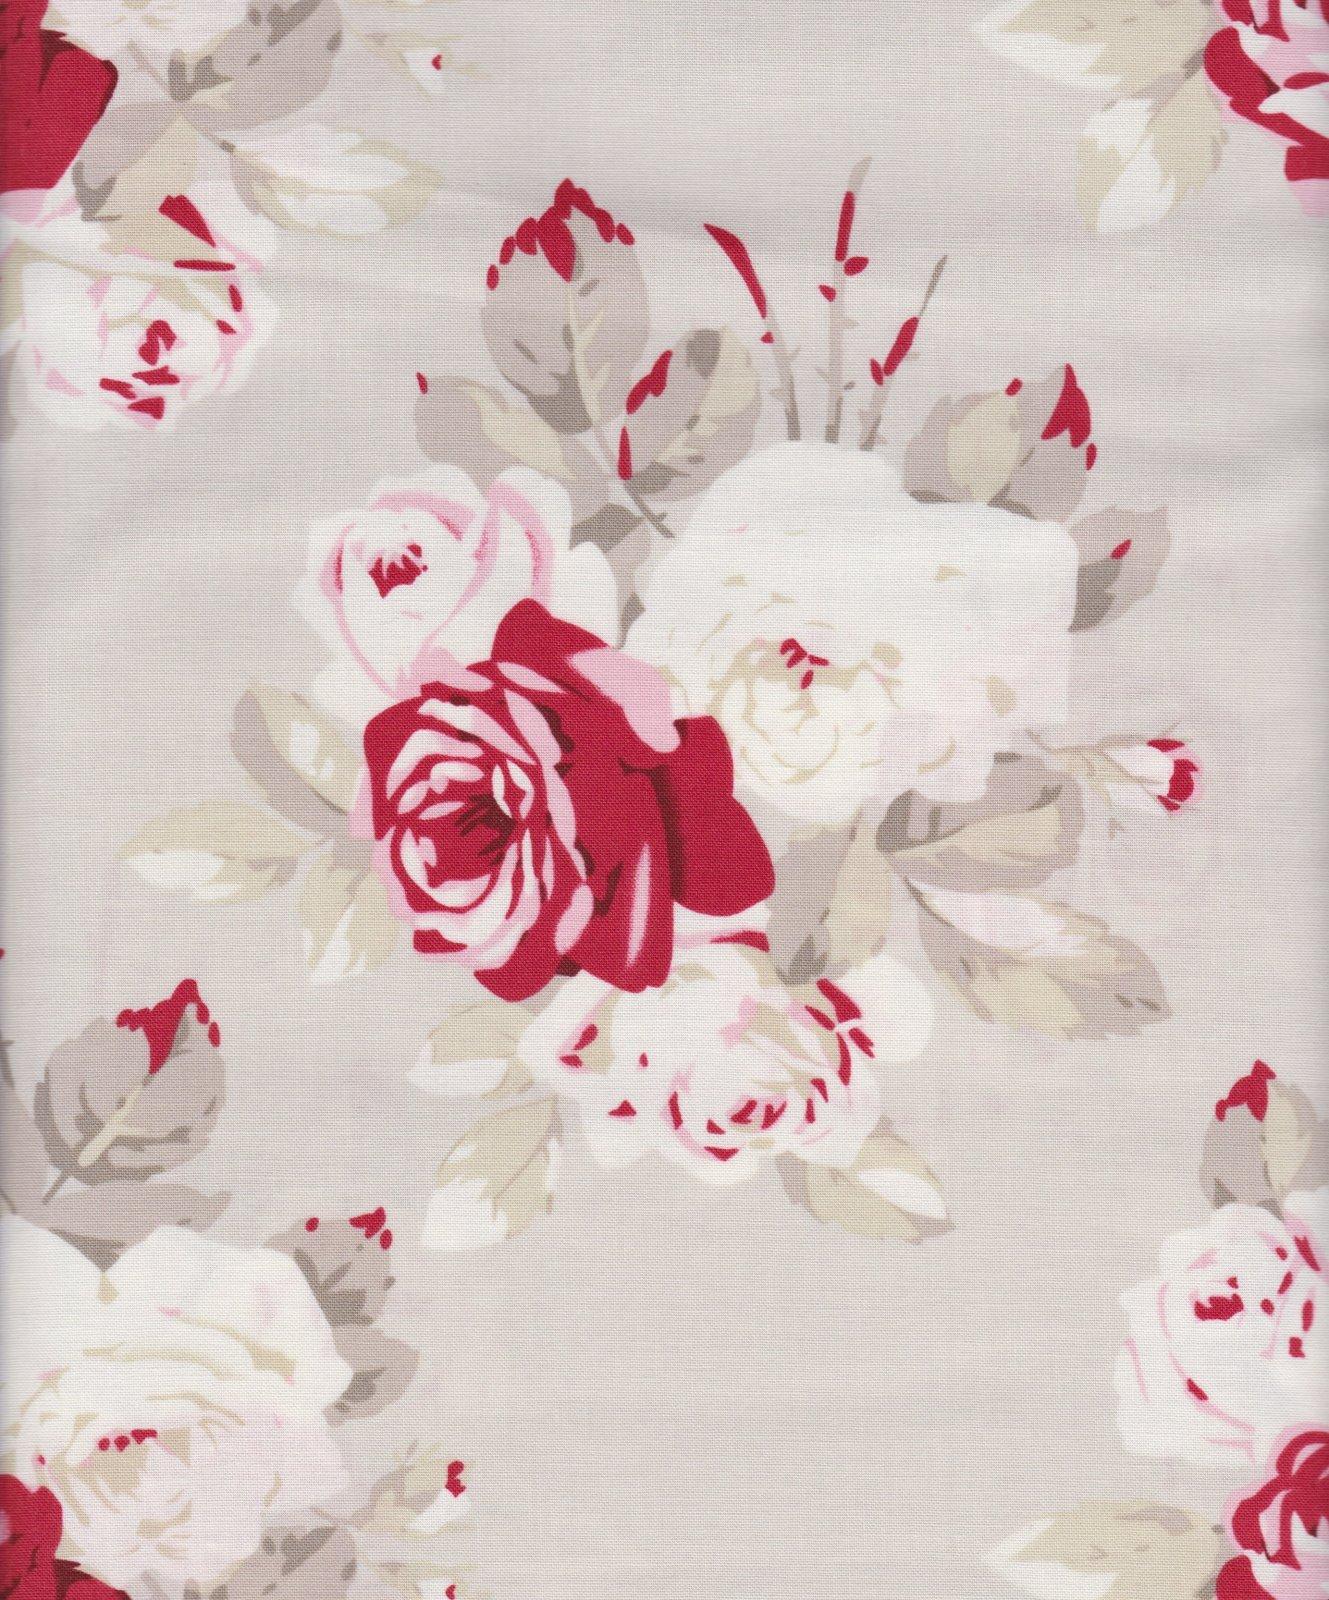 PROMO* FT-Floral Prints 16348 Roses on Tan